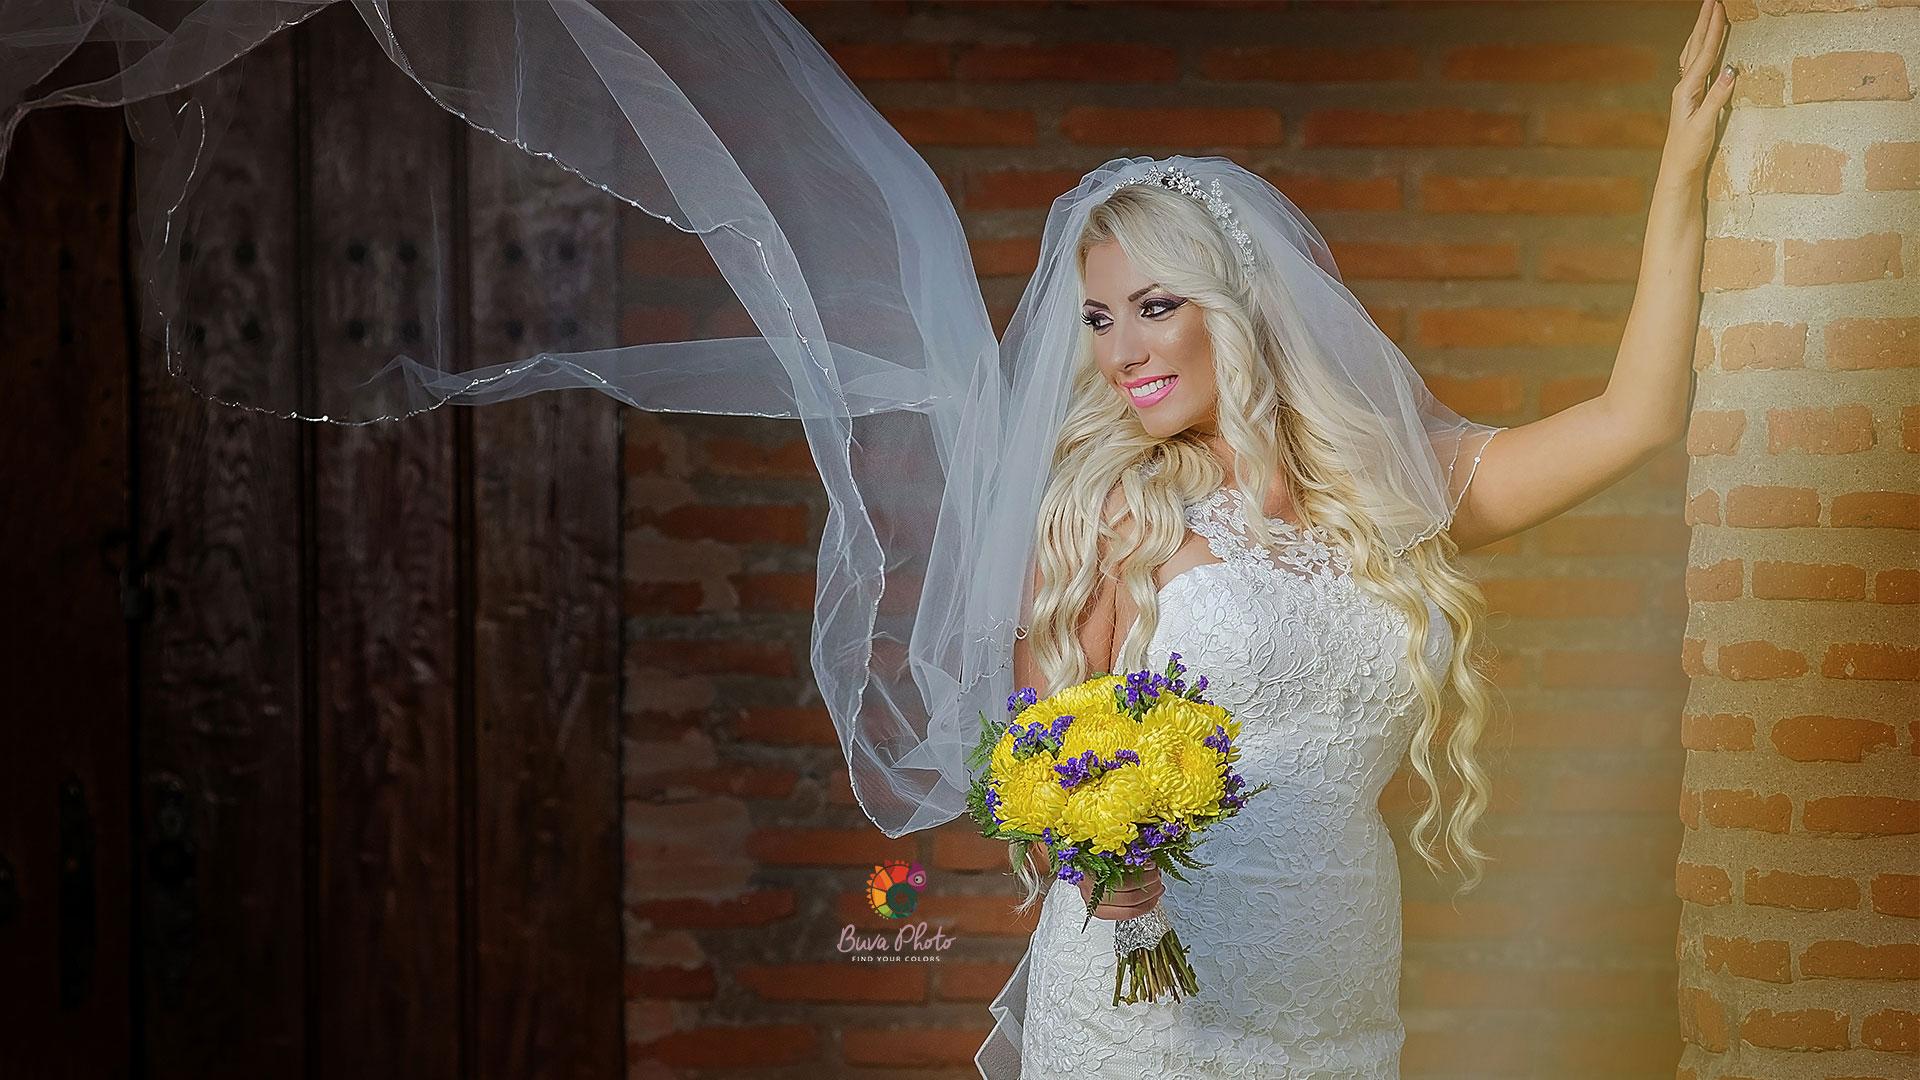 fotografie-nunta-cover-6